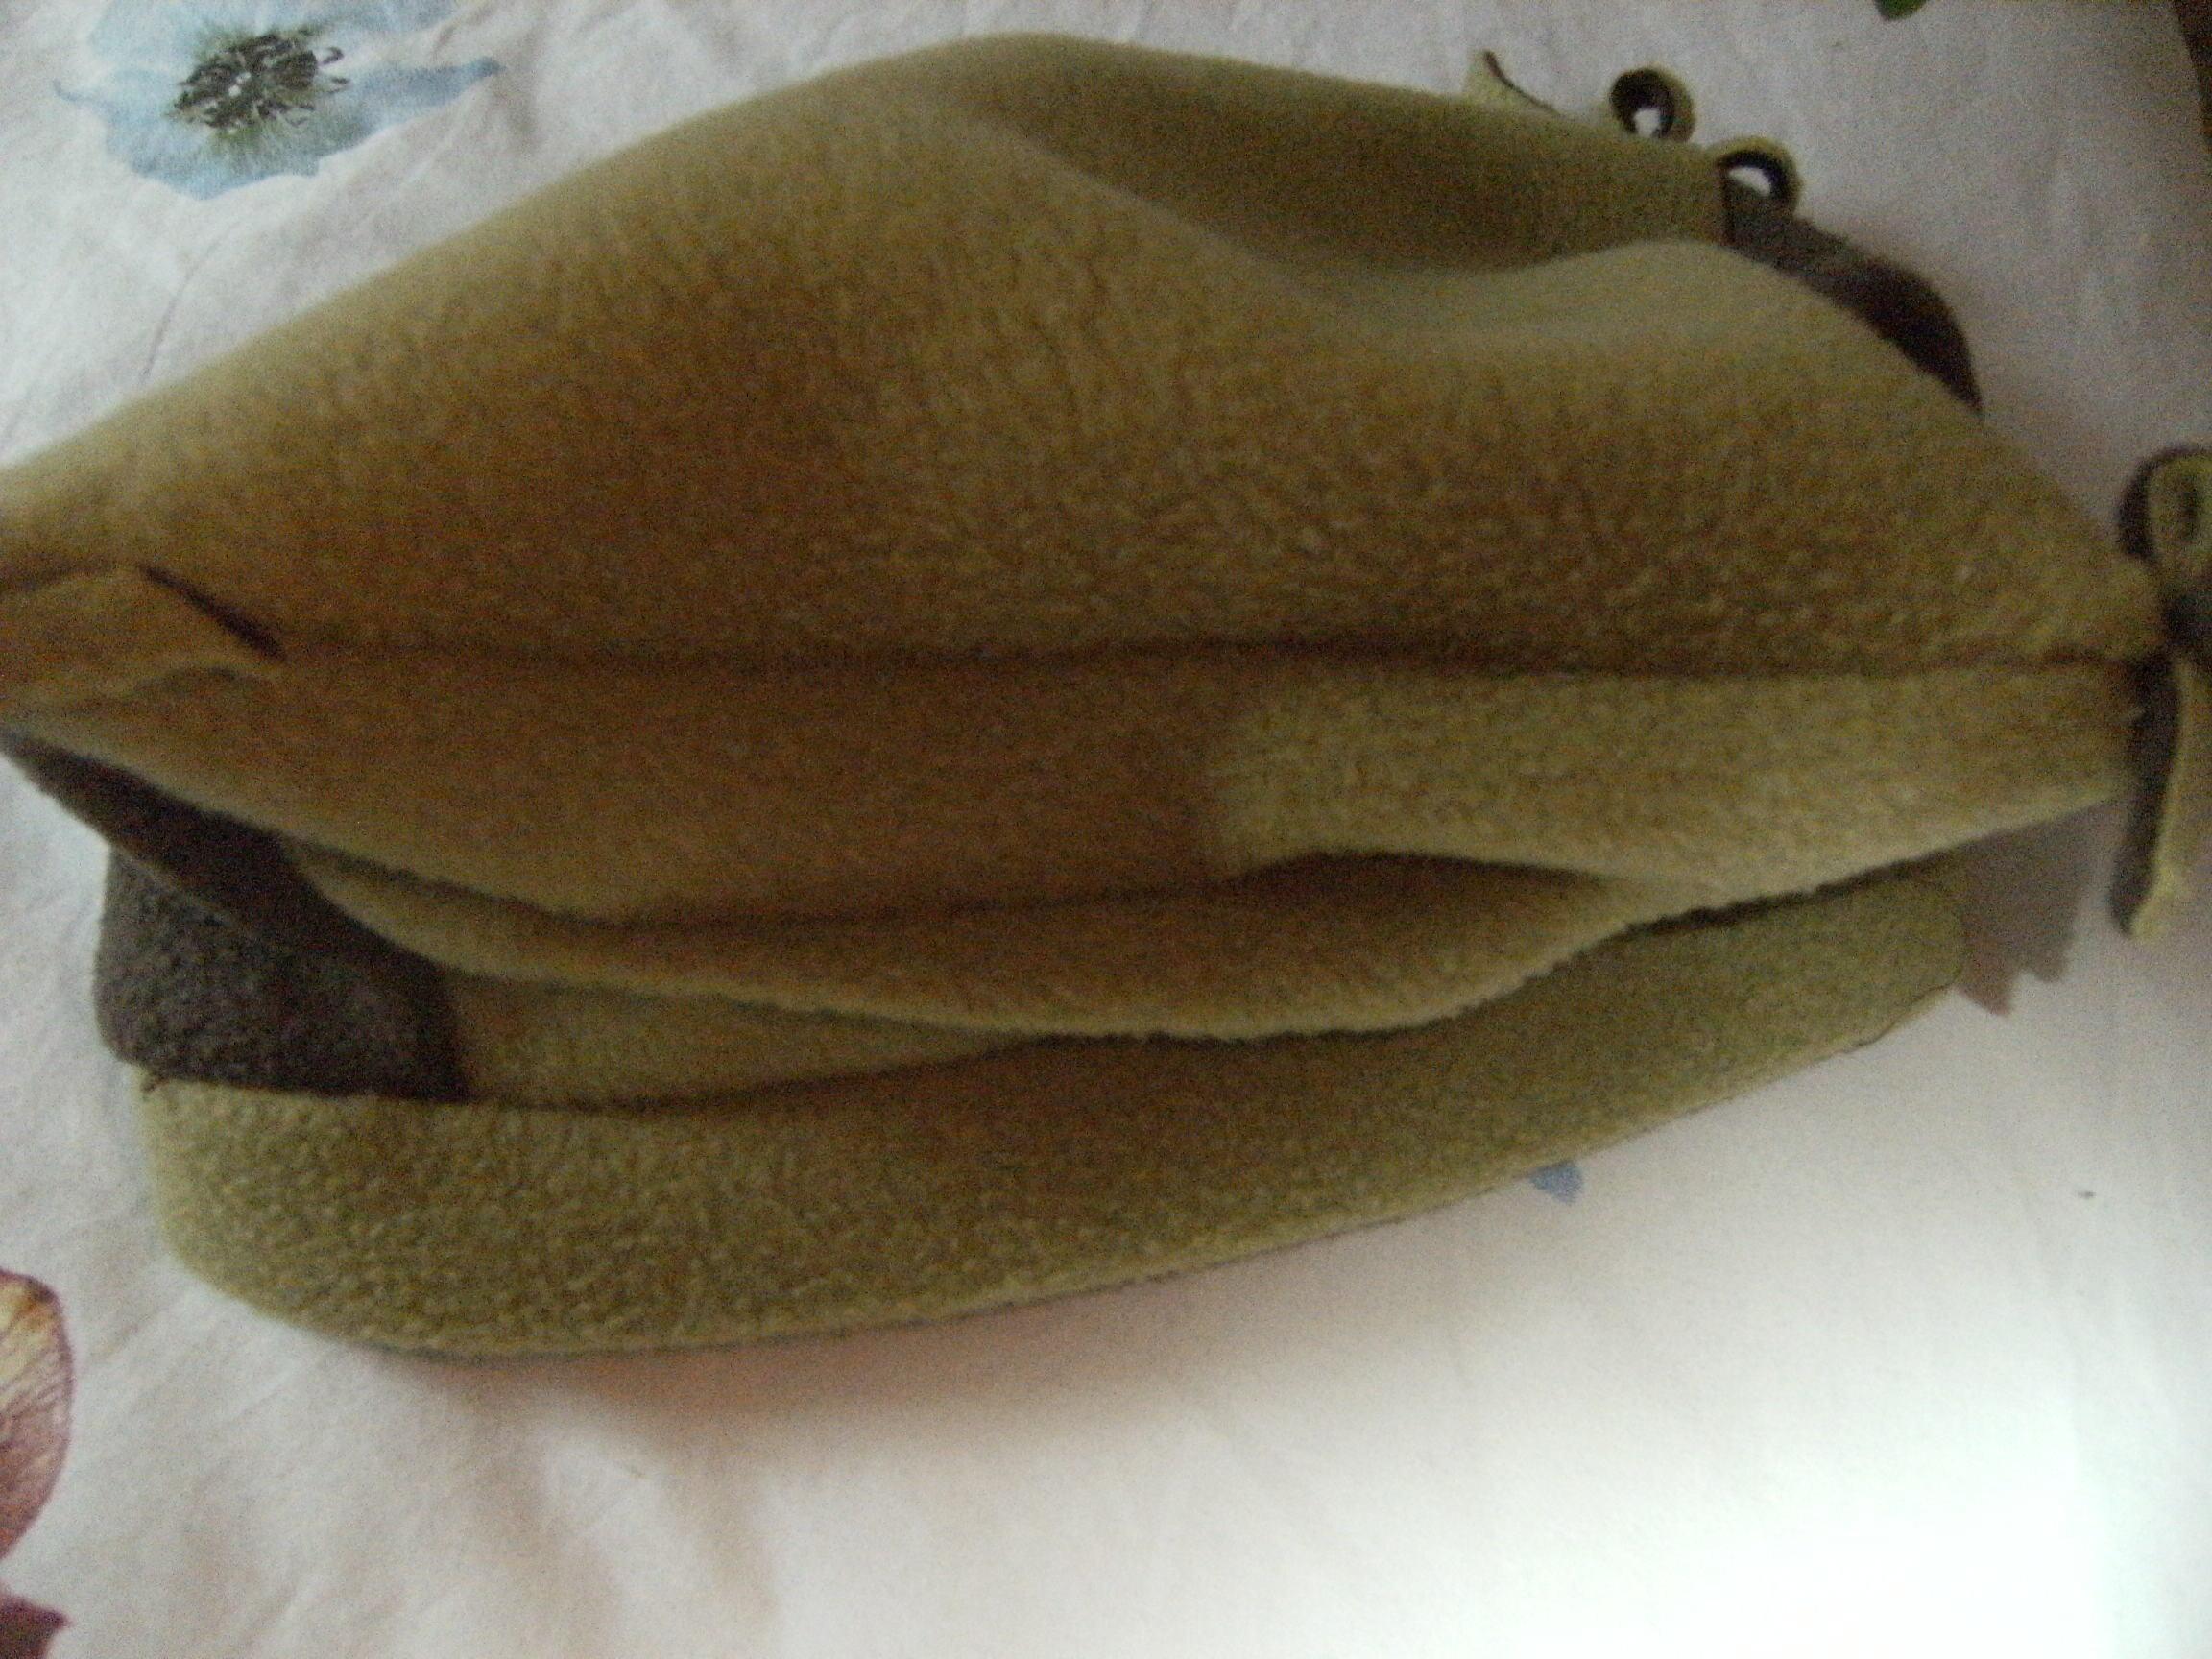 bonnet-002.jpg